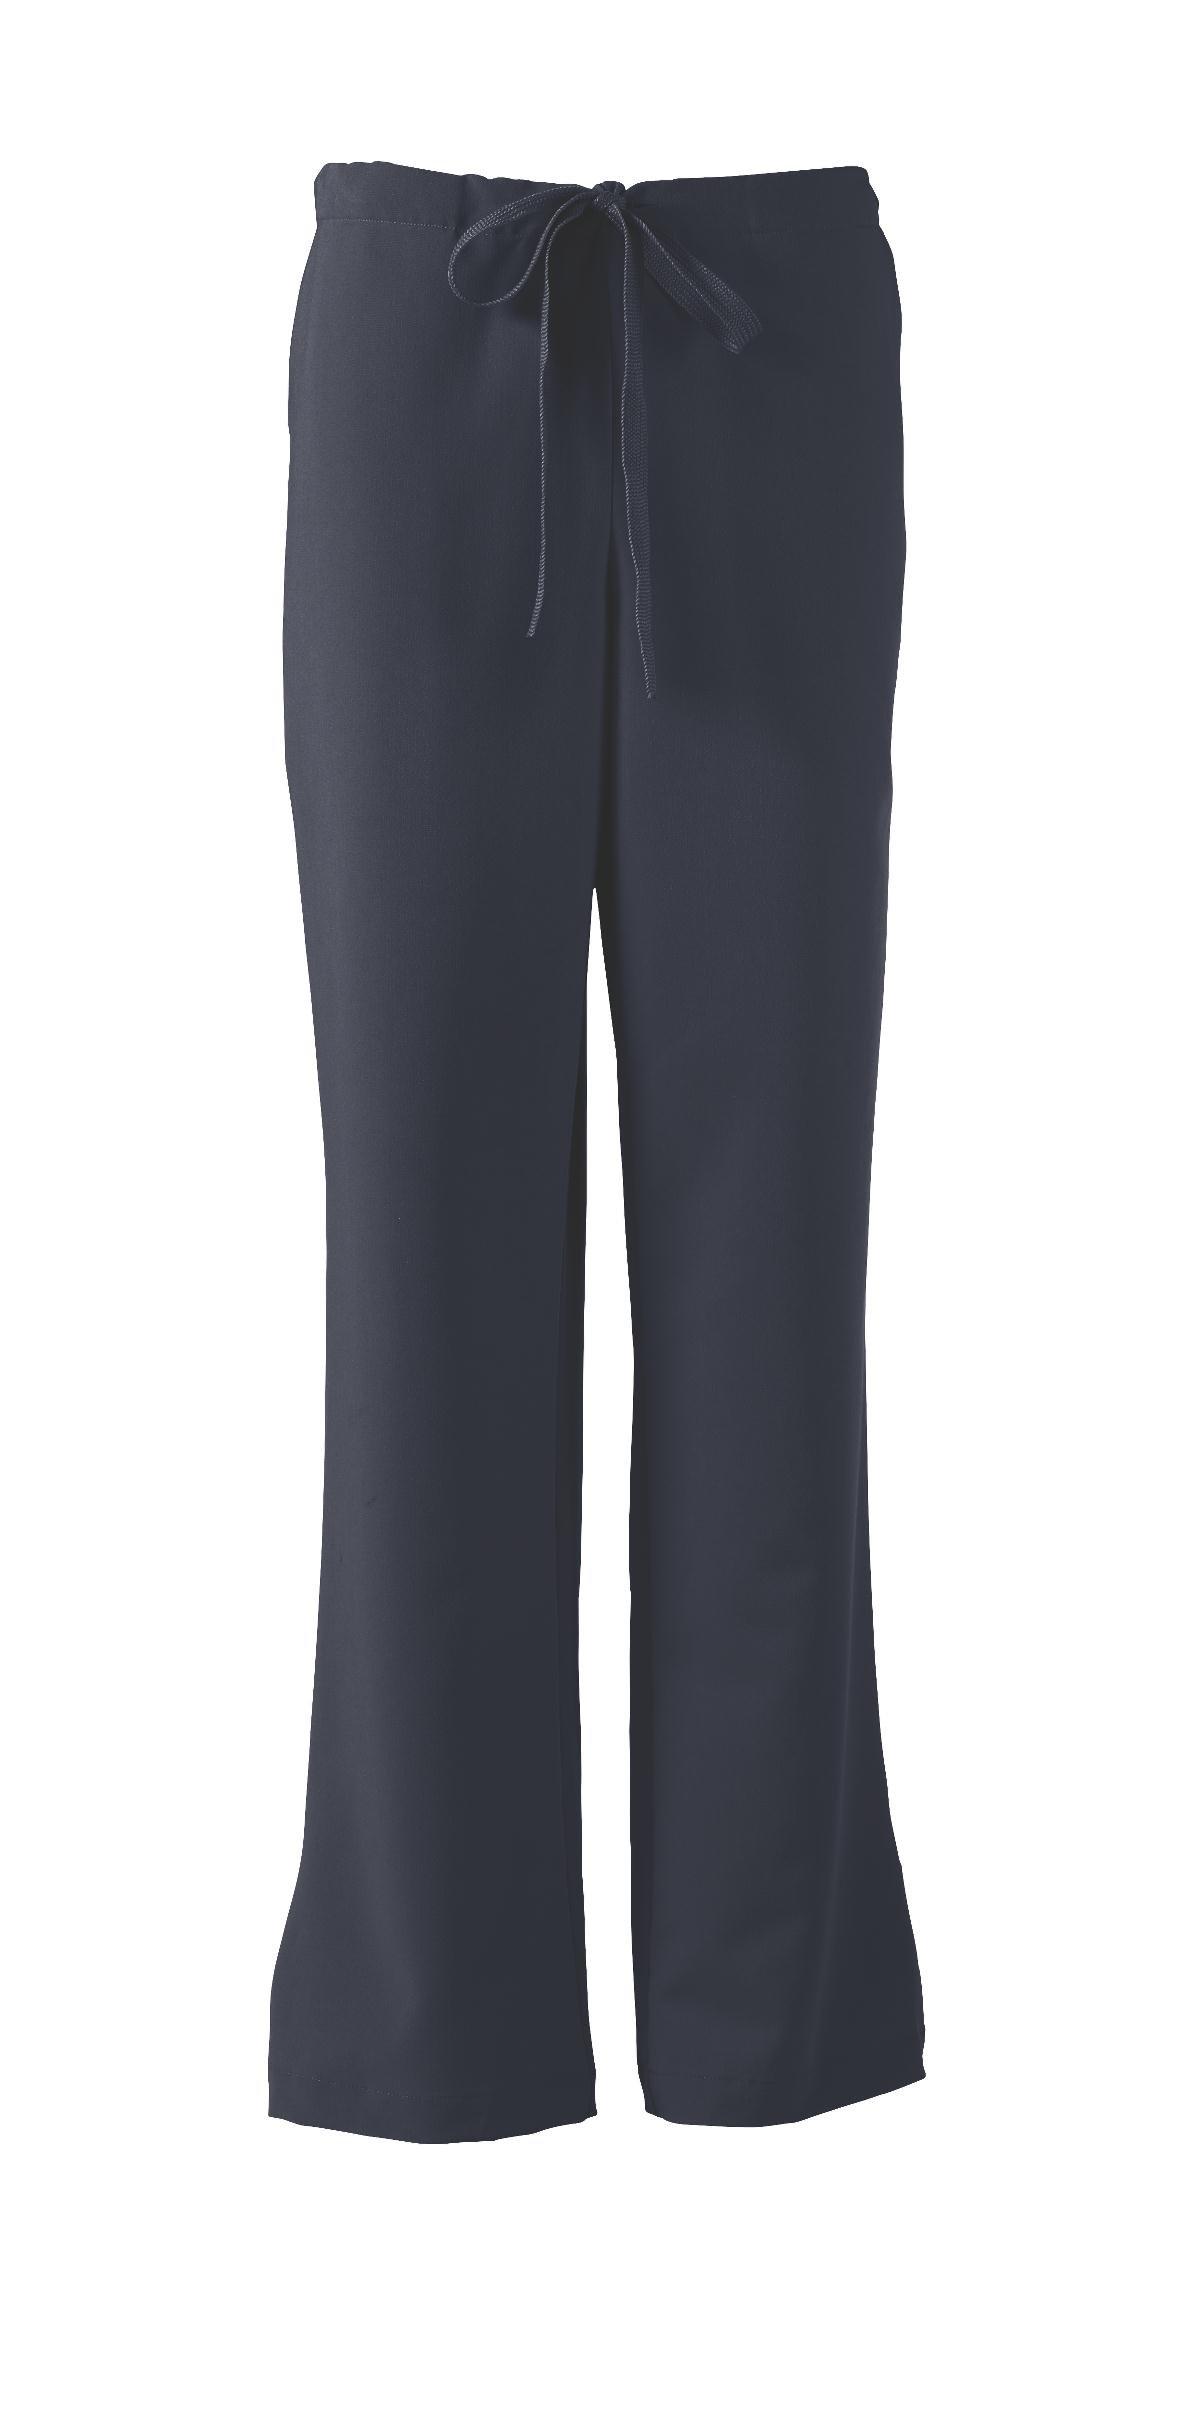 ave Women's Medical Scrub Pants, Melrose ave, Bootcut Style, Drawstring and Elastic Waist, Great for Nurses, Navy, Medium Petite